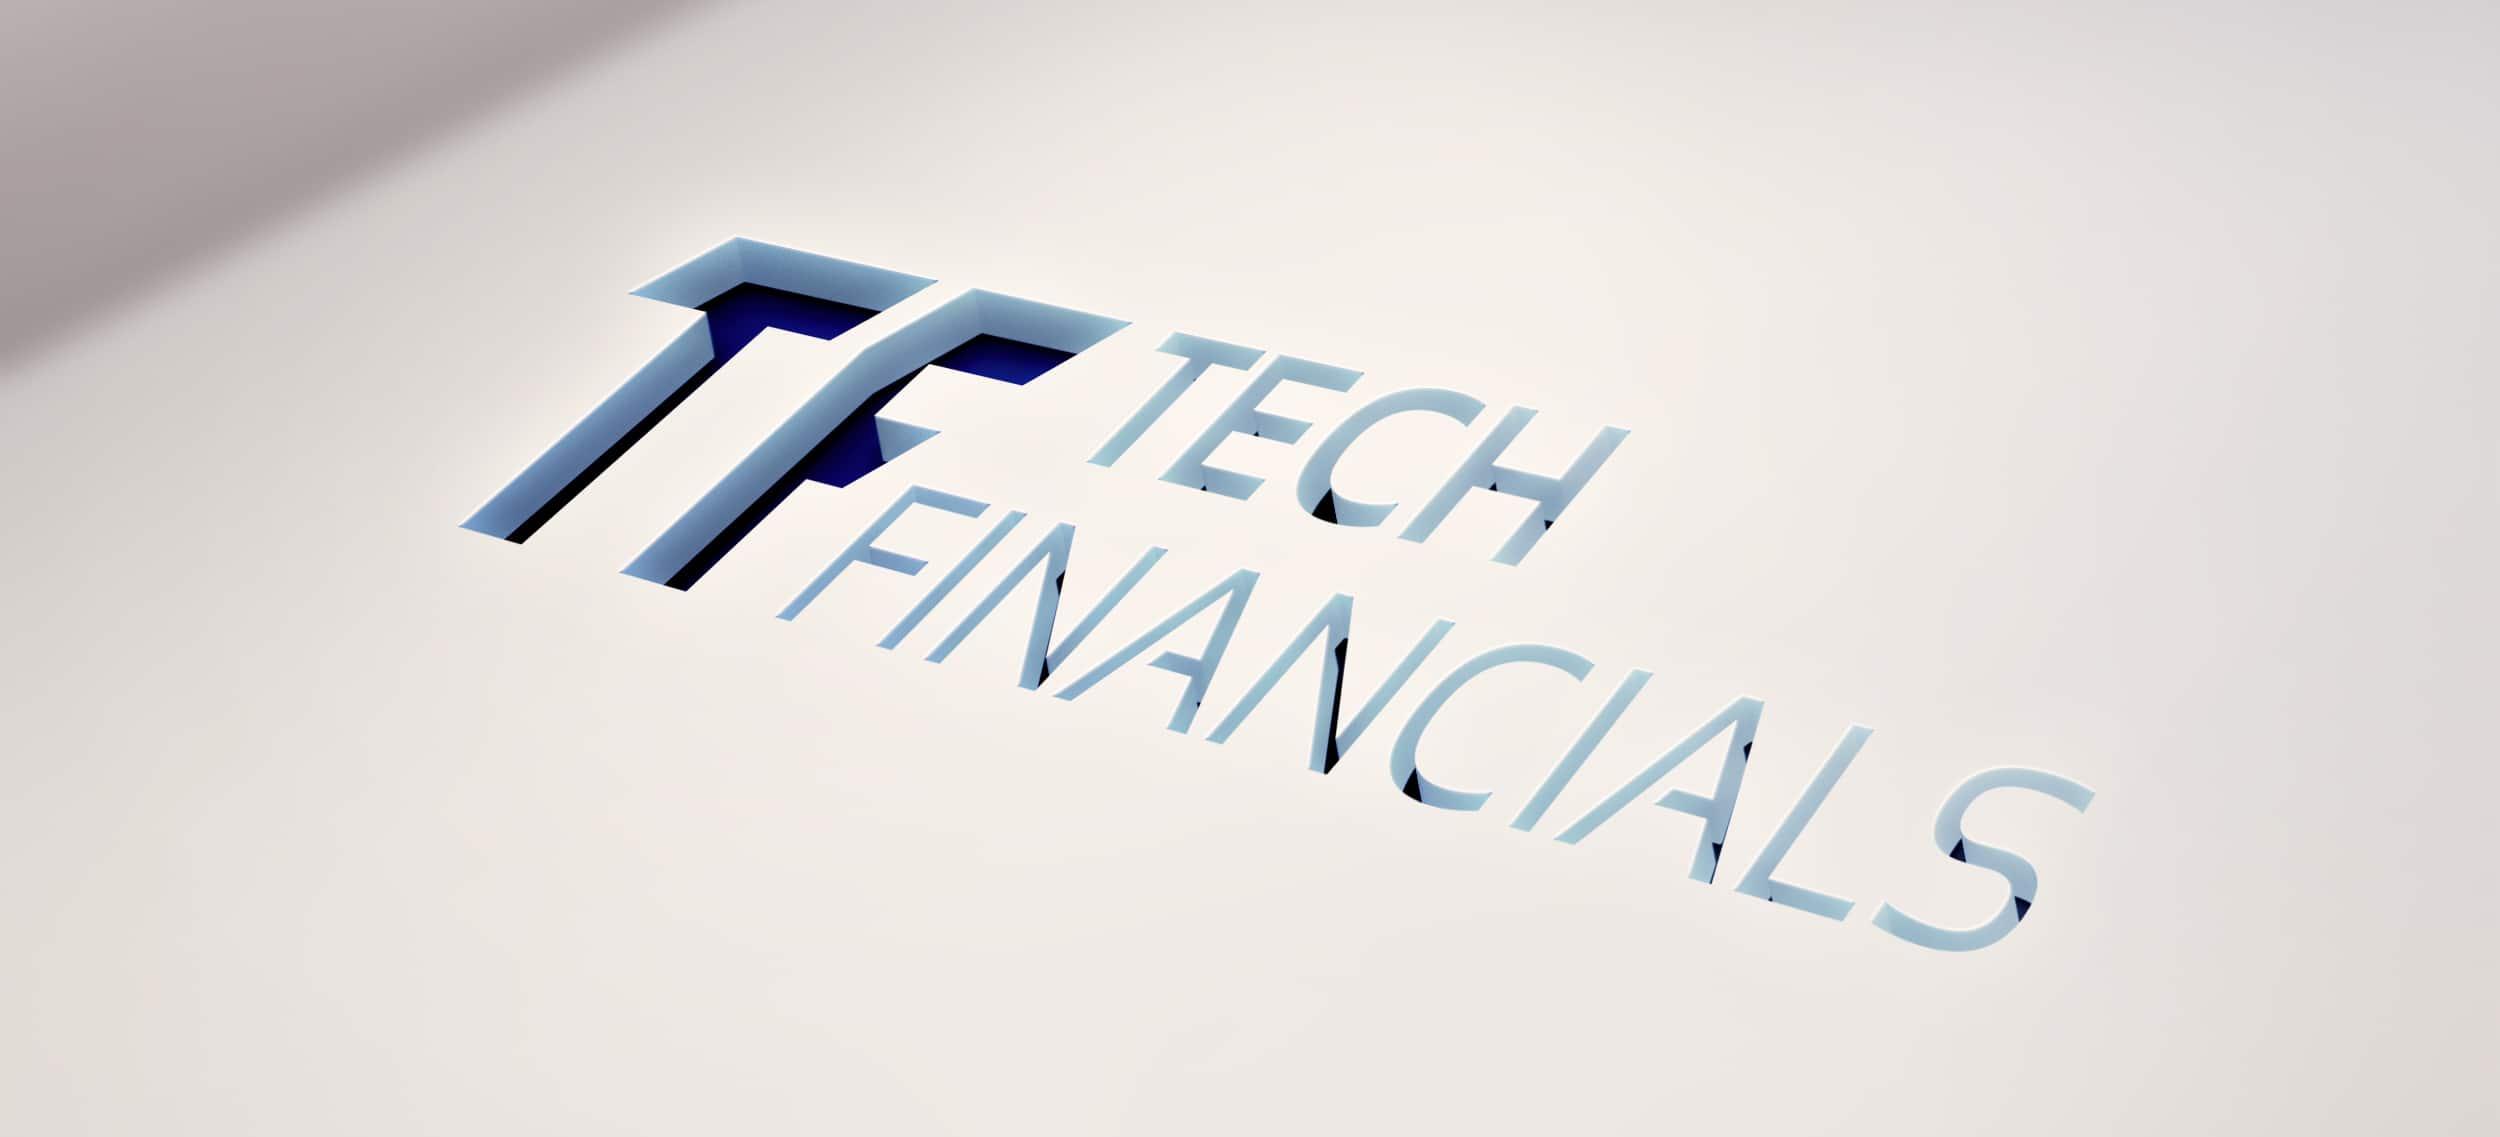 Hillik Nissani Relinquishes Role as Non-Exec Director at TechFinancials